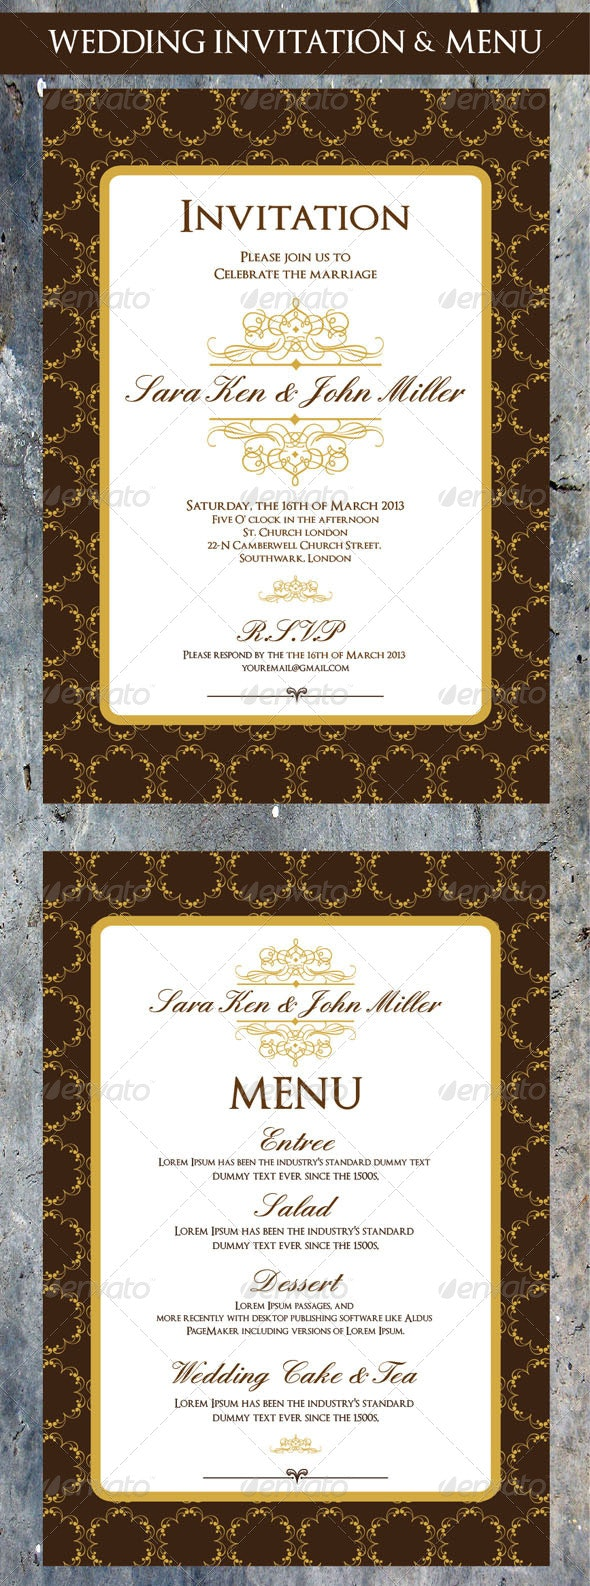 Wedding Invitation & Menu Cards Design - Cards & Invites Print Templates